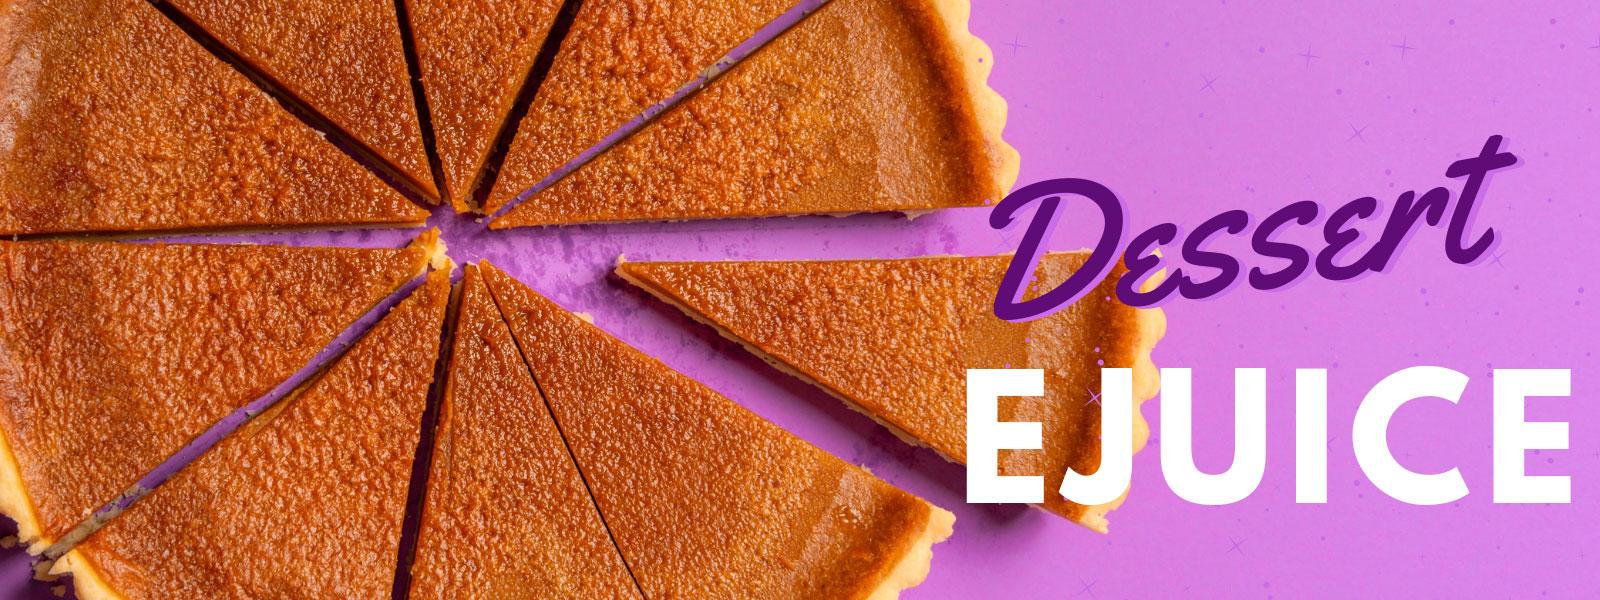 Dessert ejuice